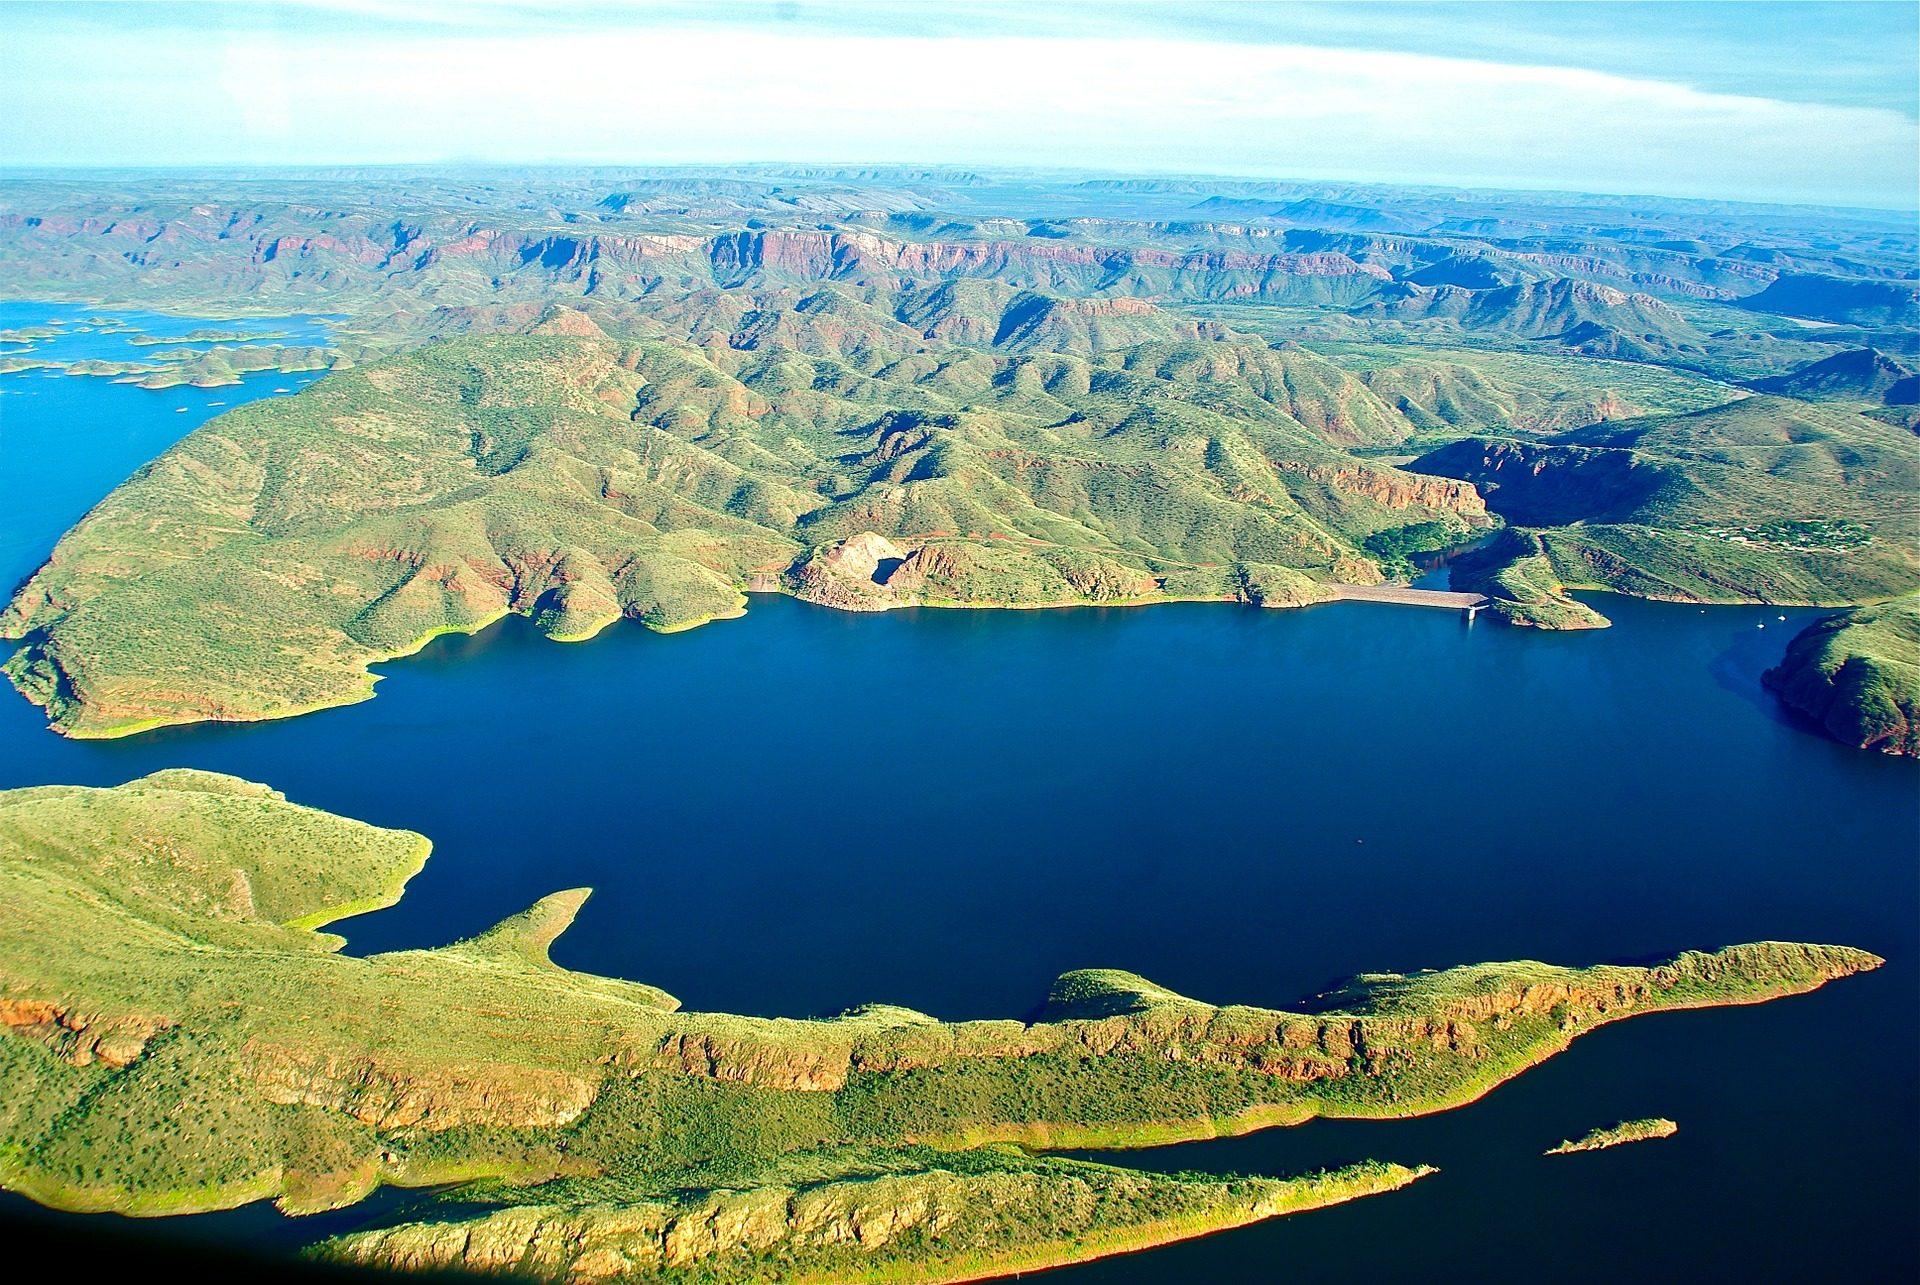 Affichage, distance, horizon, Iles, Costa, Australie - Fonds d'écran HD - Professor-falken.com